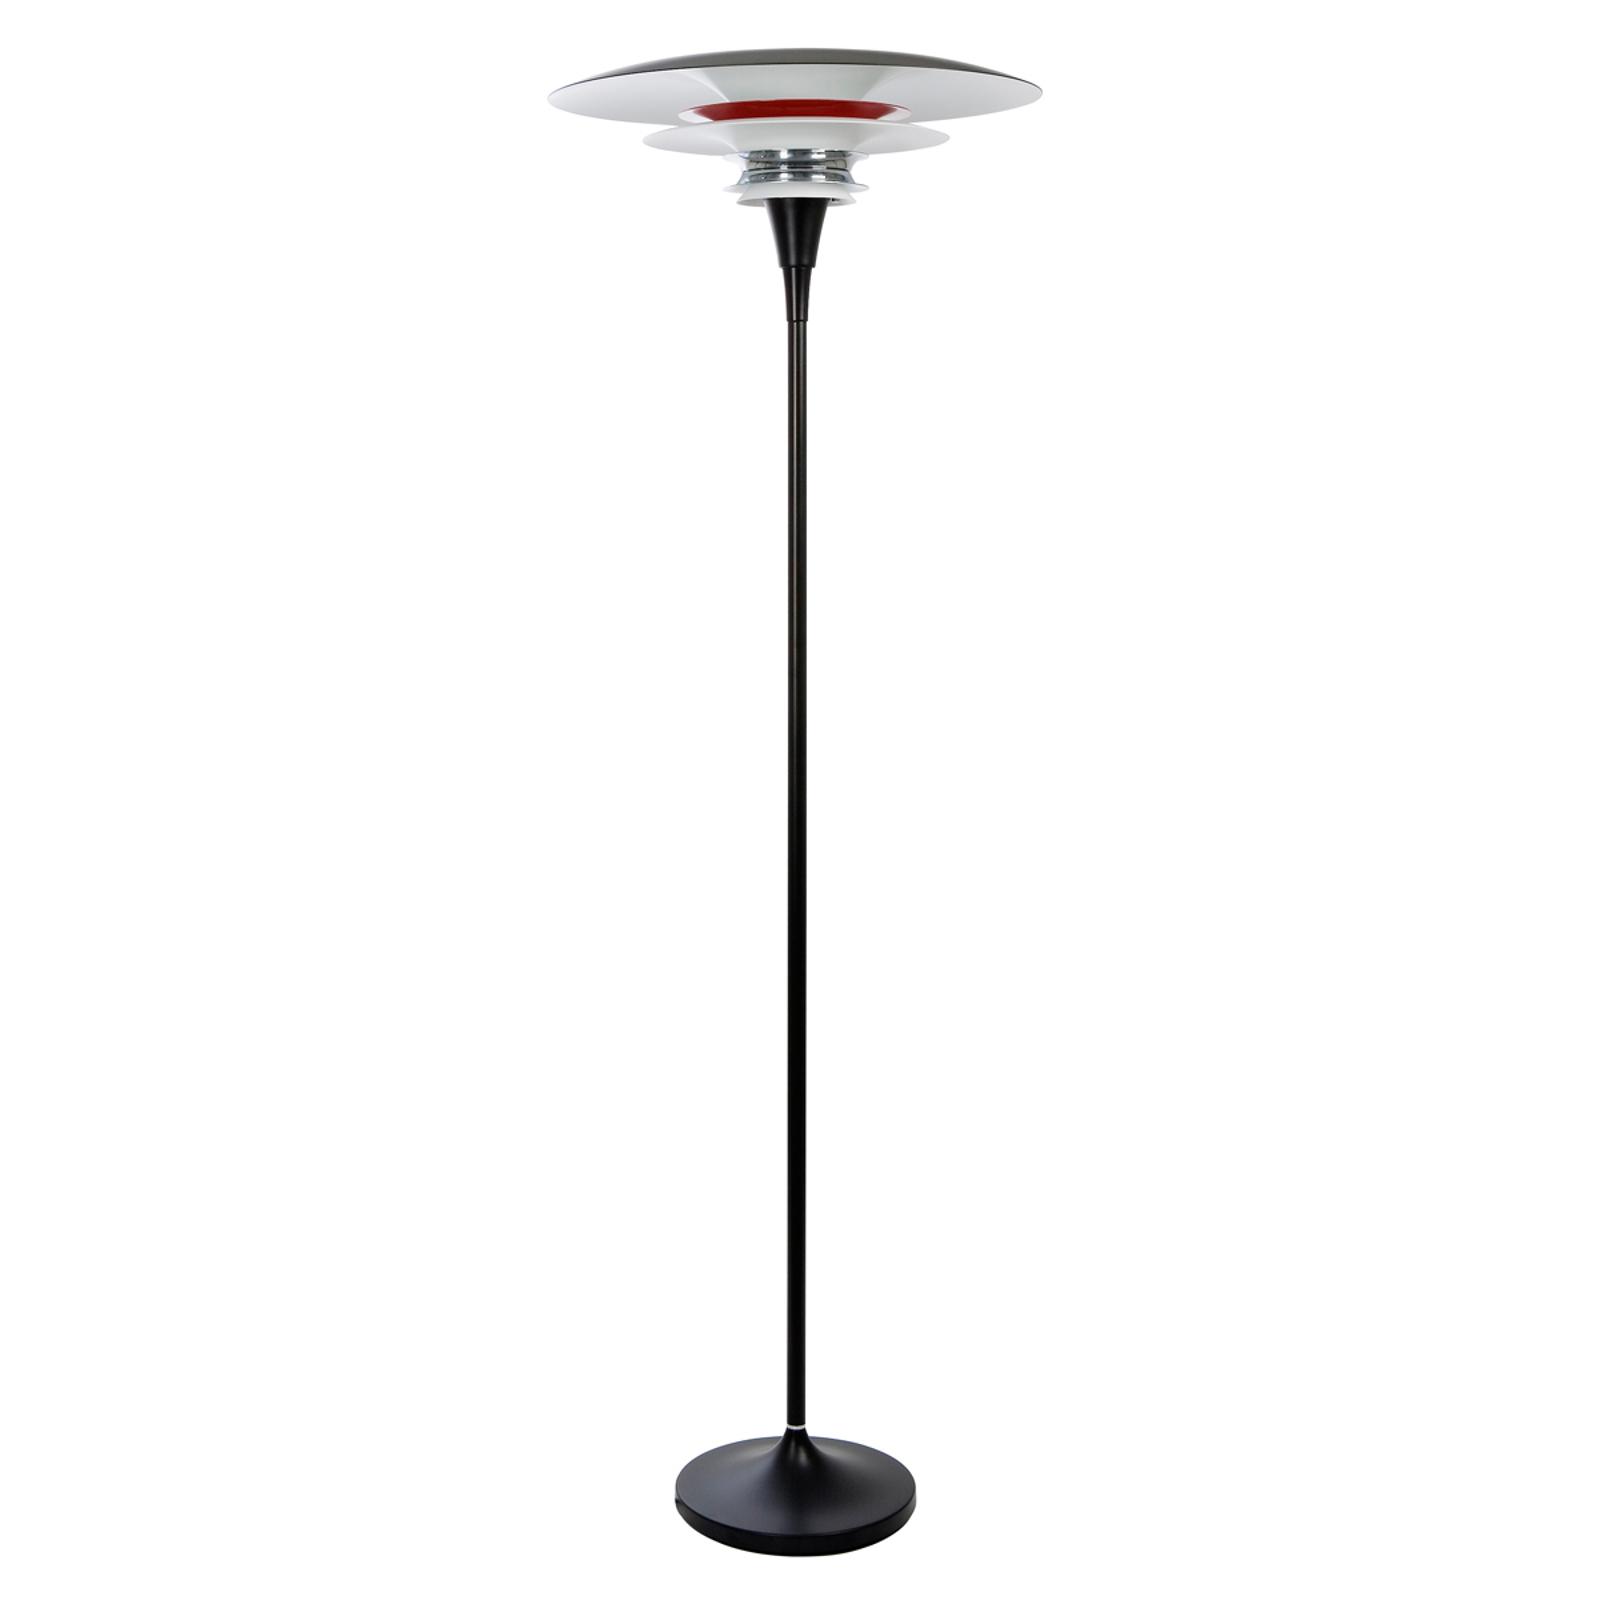 Zwart-rode vloerlamp Diablo